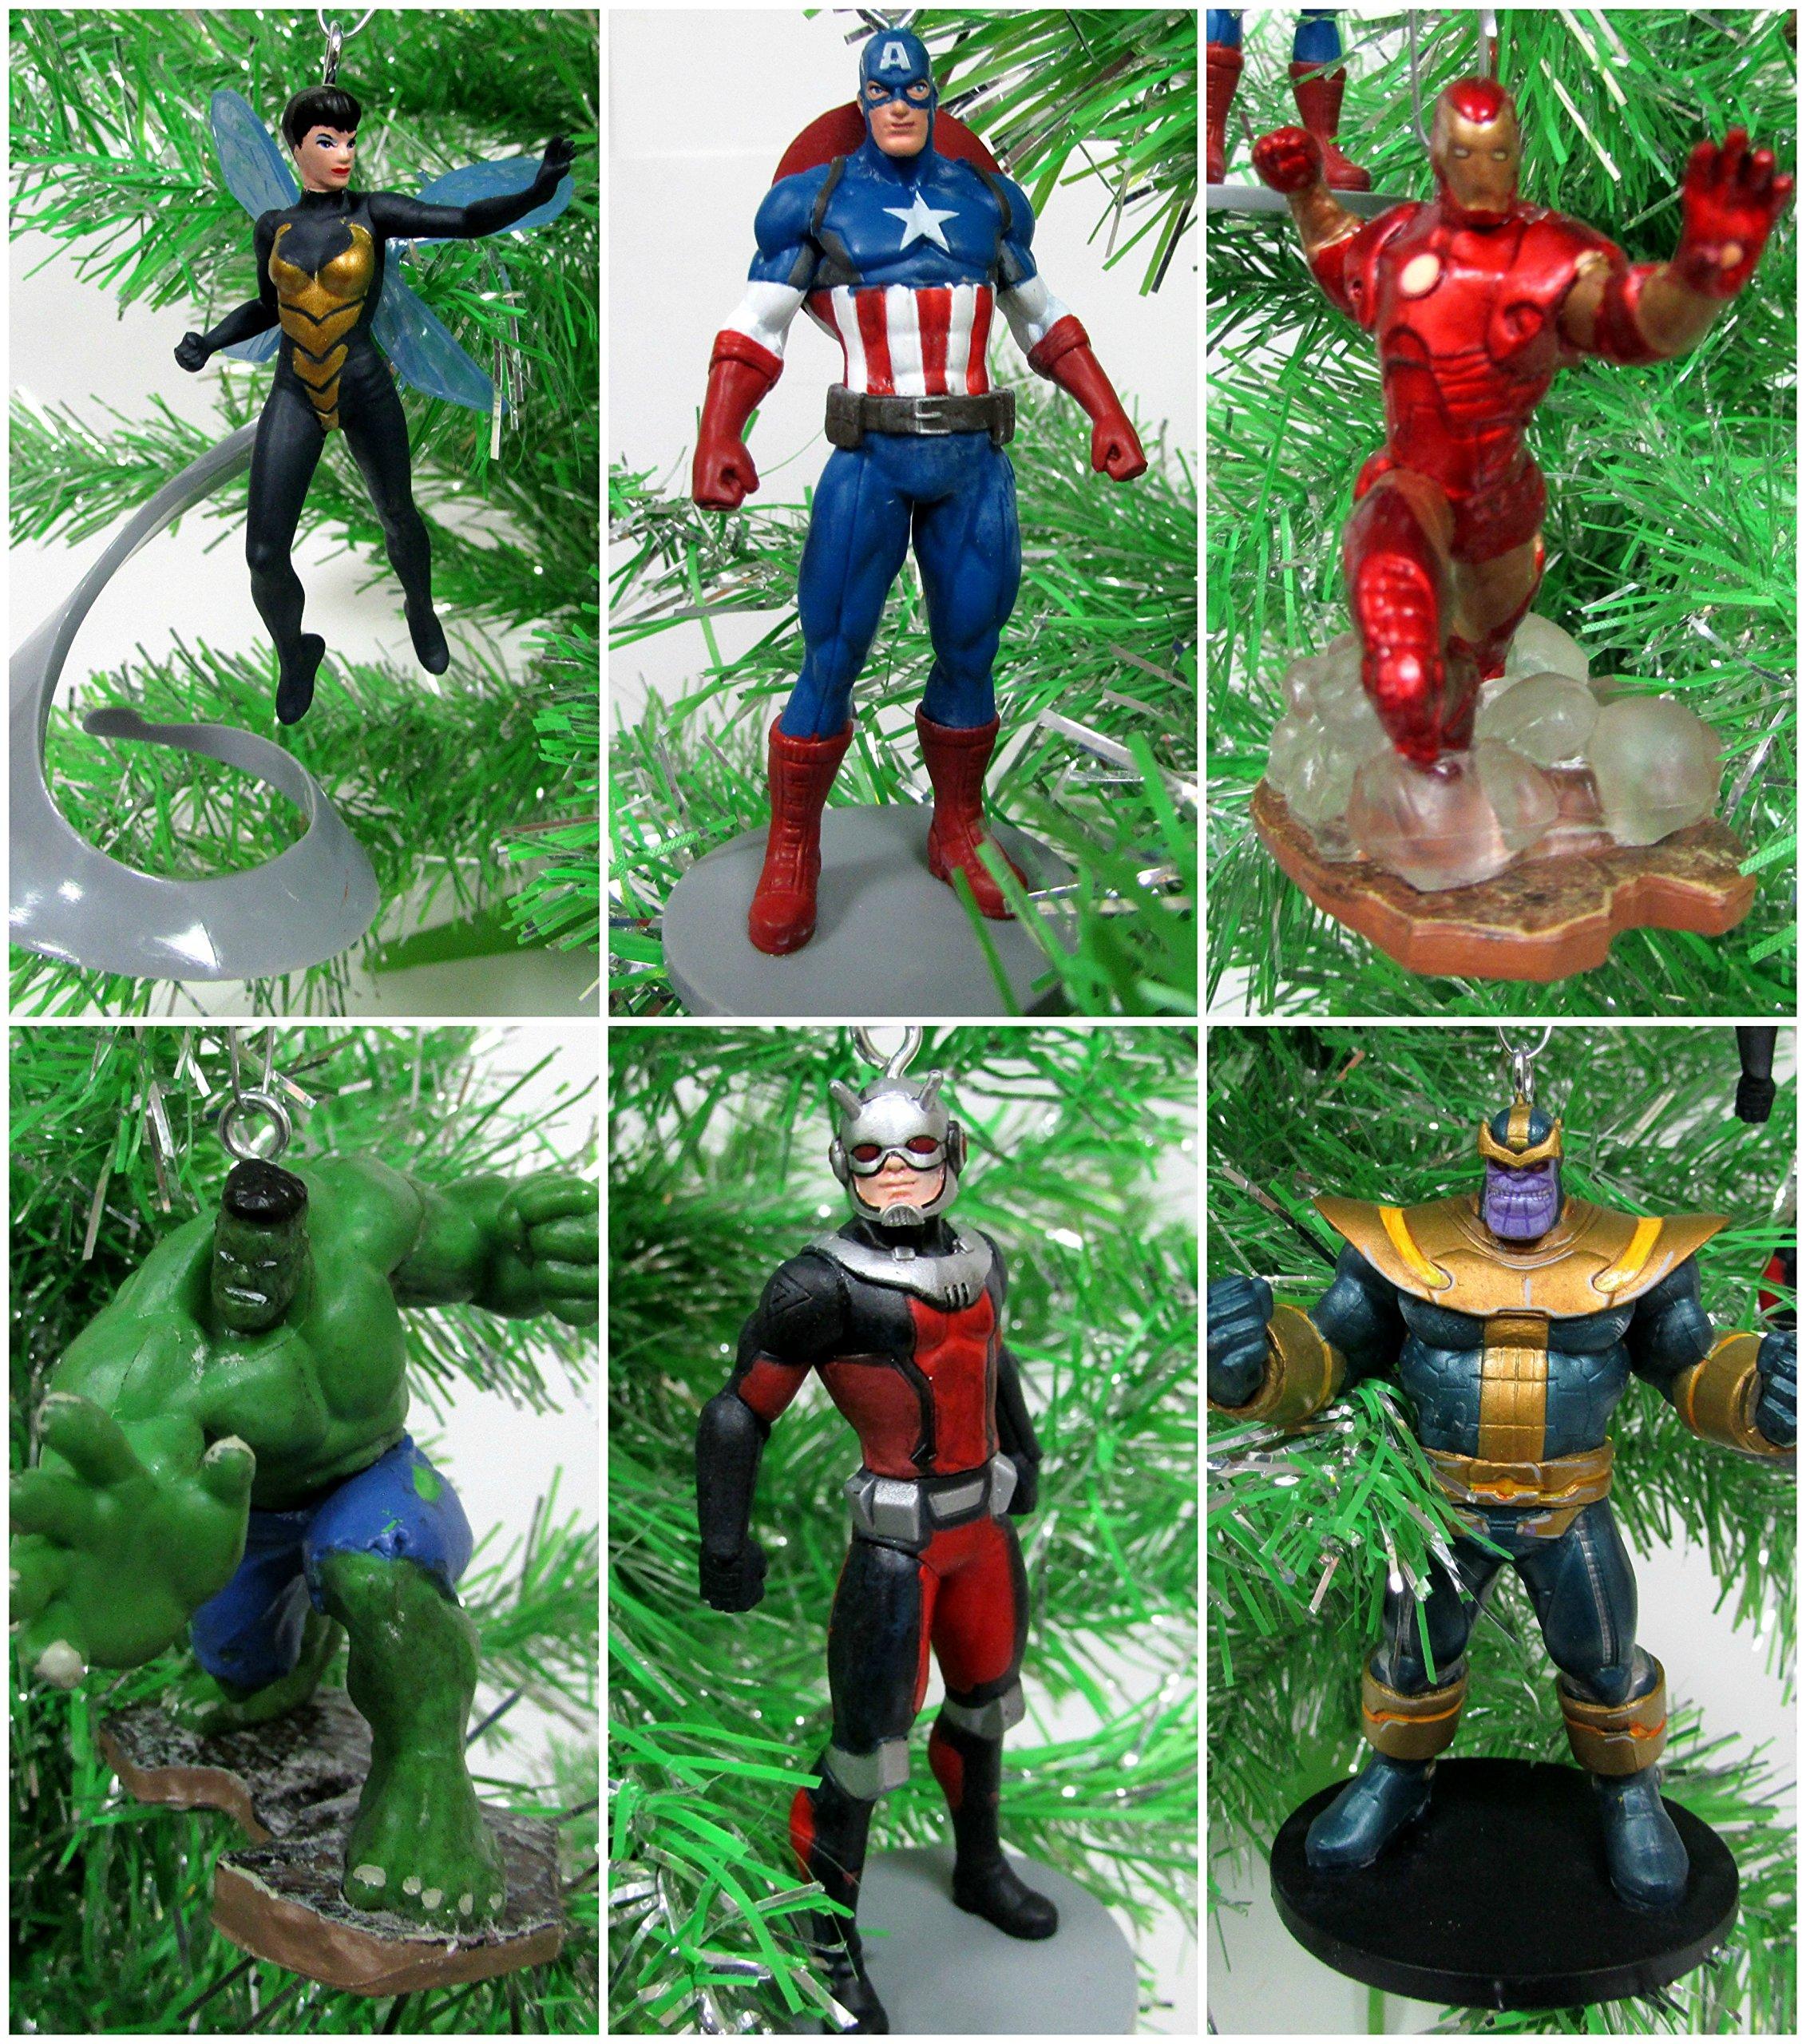 Marvel Avengers Super Hero 6 Piece Christmas Tree Ornament Set Featuring Ant-Man, Wasp, Thanos, Hulk, Captain America and Iron Man